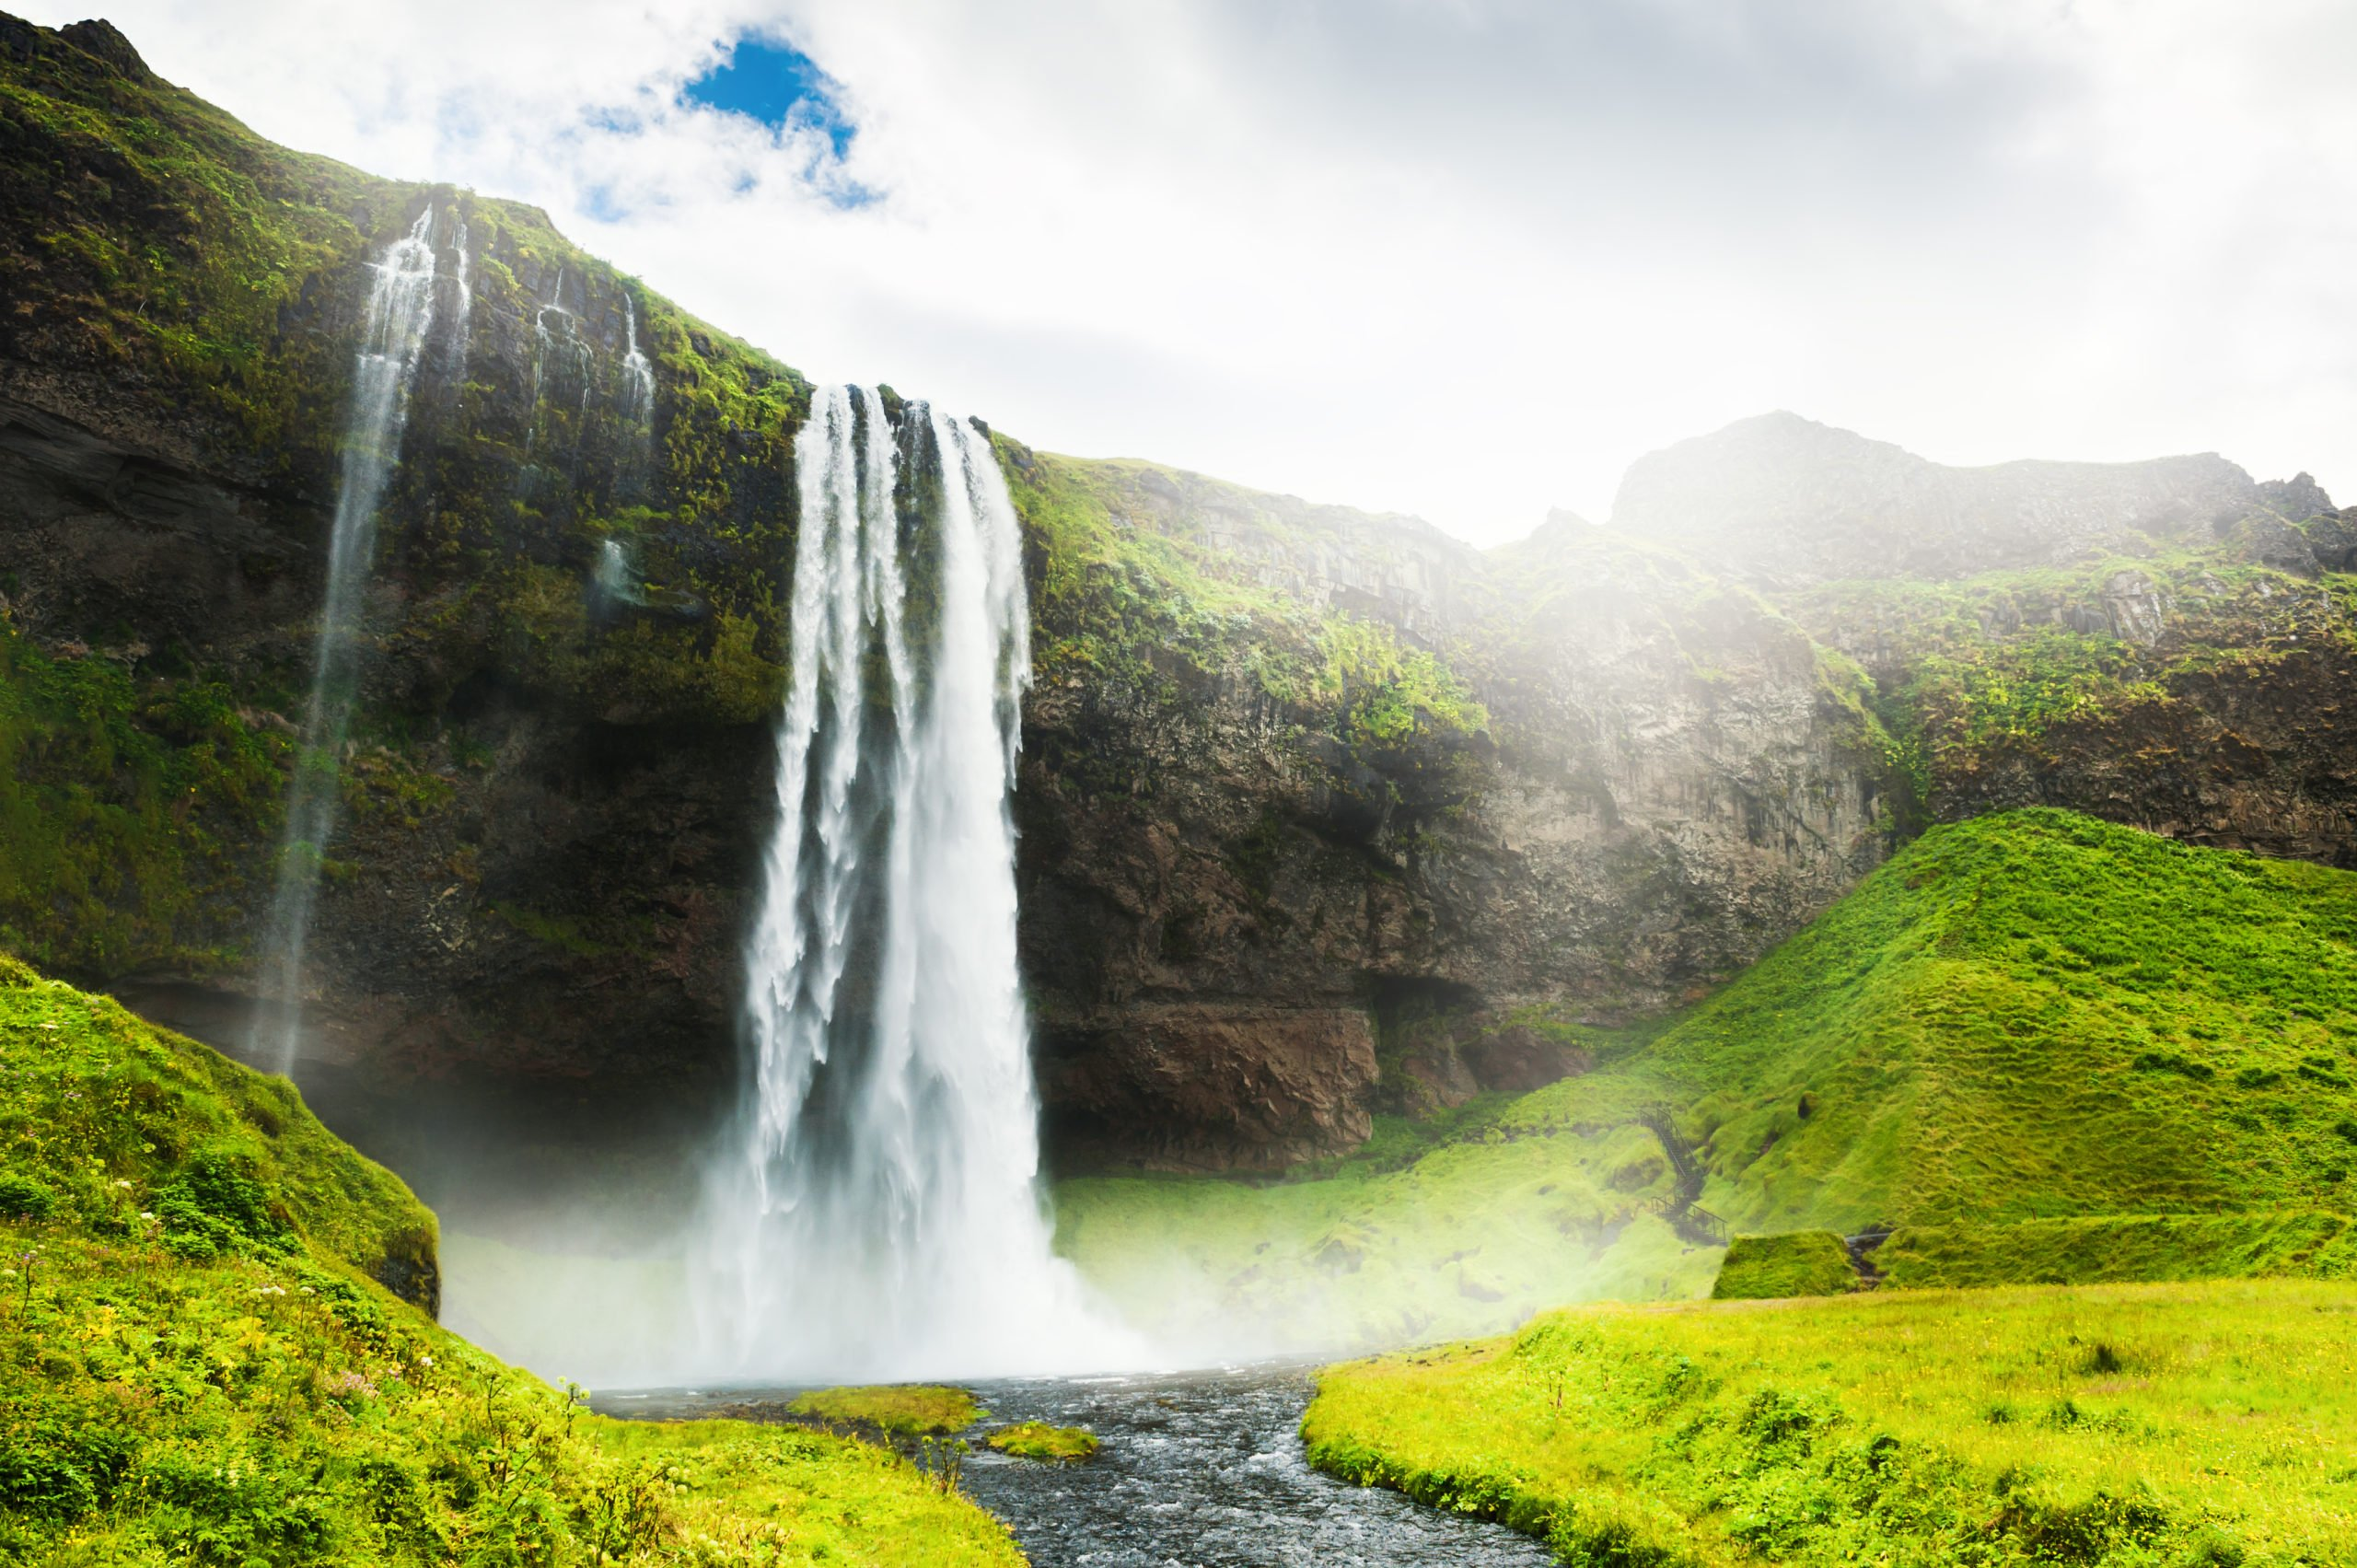 Your Jökulsárlón Glacier Lagoon Tour Will Stop At One Of The Most Famous Landmarks Of Iceland - Selijalandsfoss Waterfall